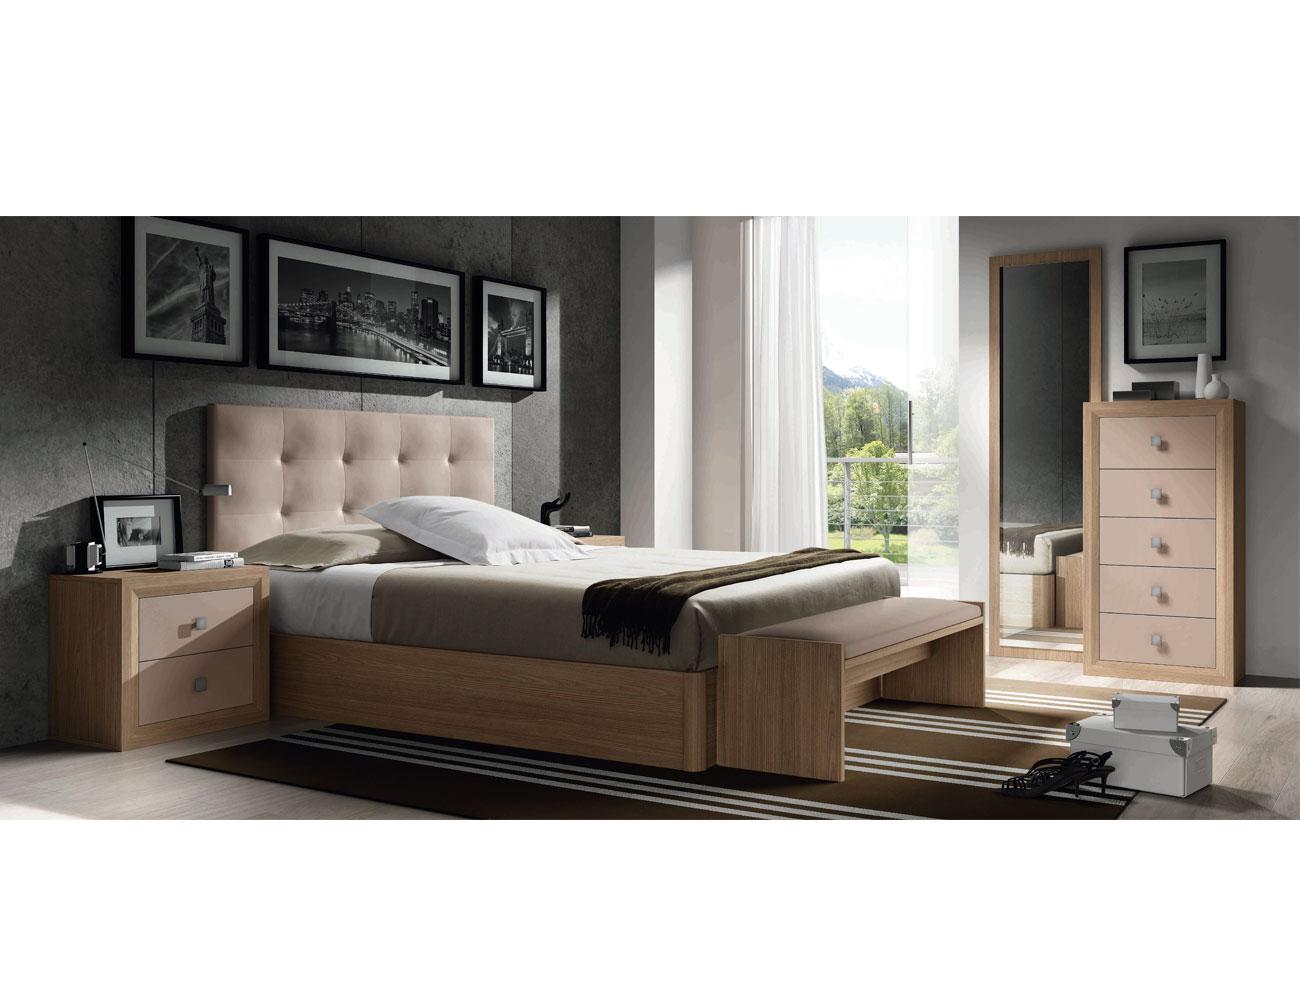 9 dormitorio matrimonio cabecero tapizado sinfonier olmo capuchino